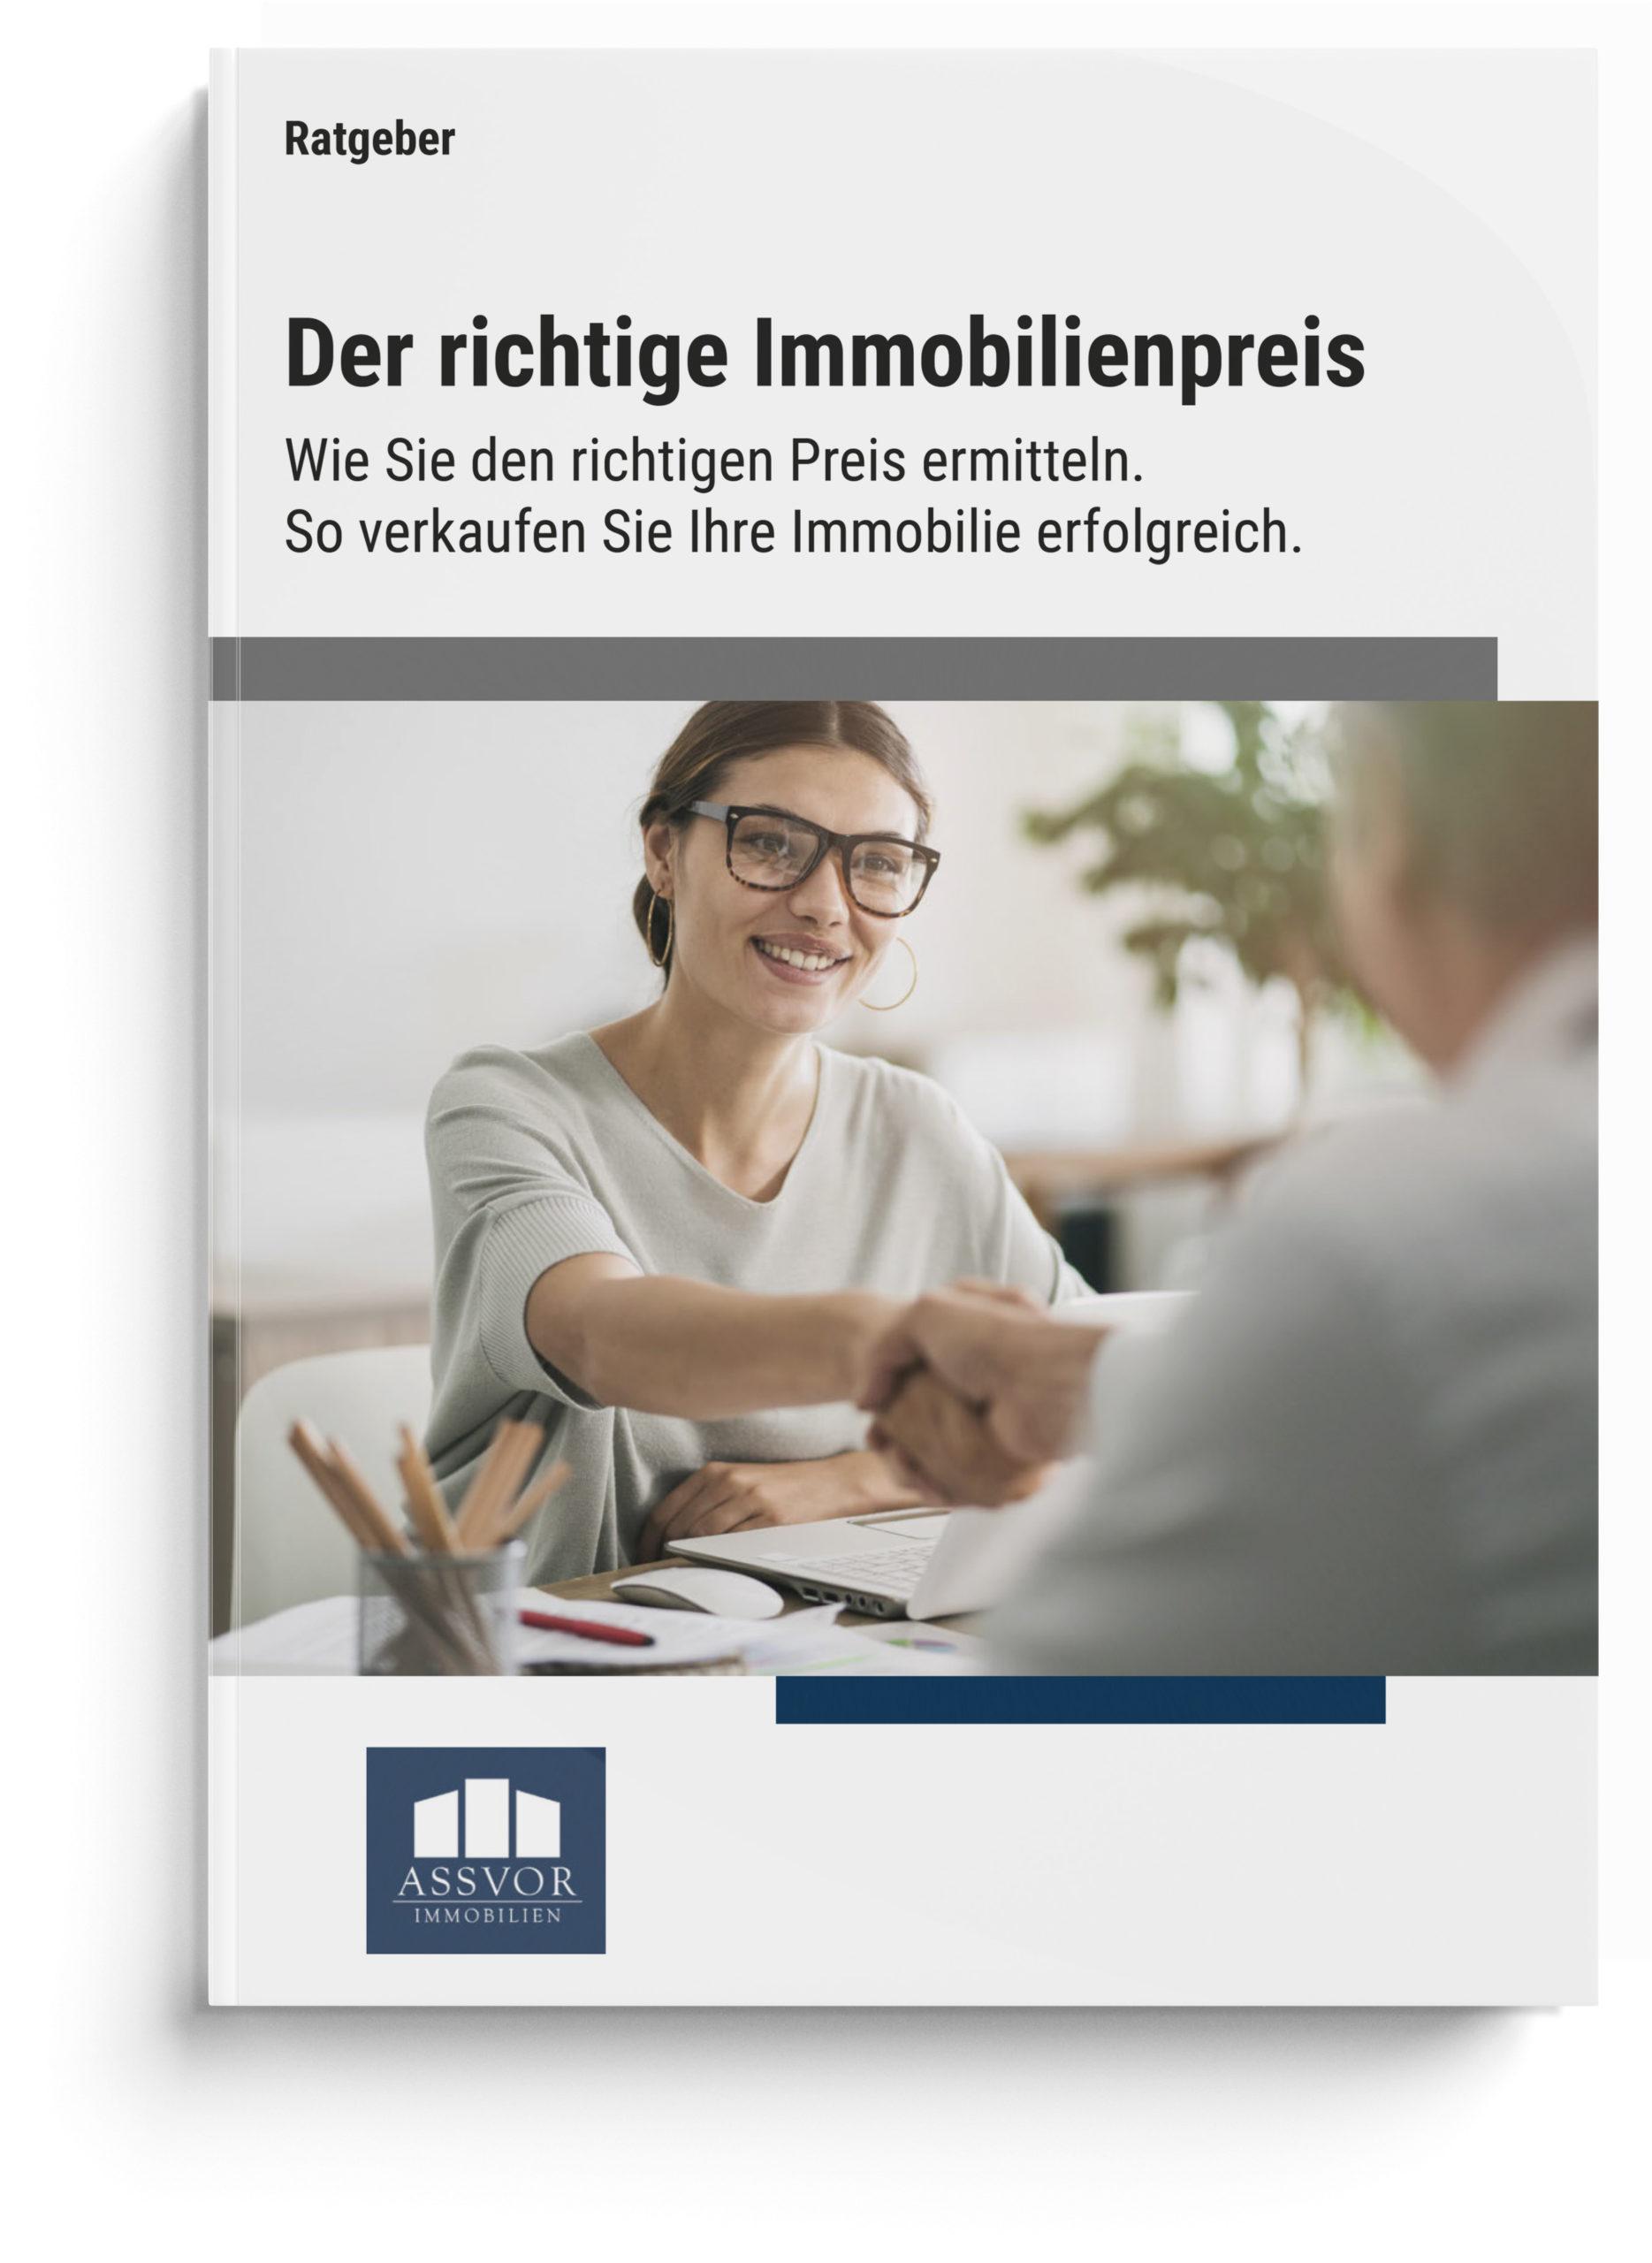 Ratgeber Mockup Kaufpreis Angebotspreis Immobilienpreis ermitteln